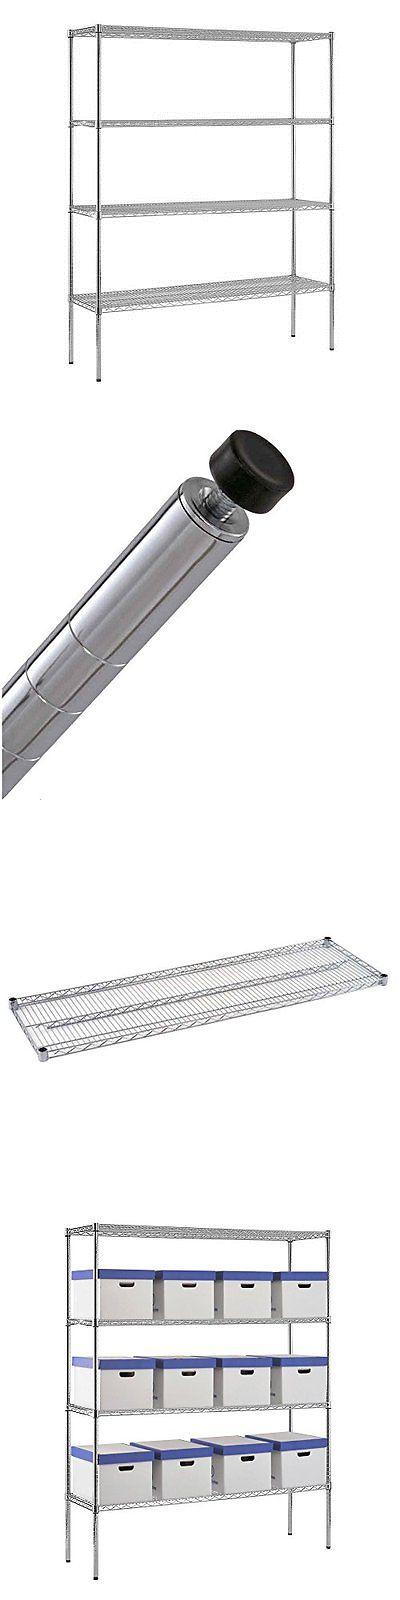 Shelves 134649: Sandusky Chrome Steel Hd Wire Shelving 2400 Lbs Capacity 60In Width X 74In Heigh -> BUY IT NOW ONLY: $145.62 on eBay!